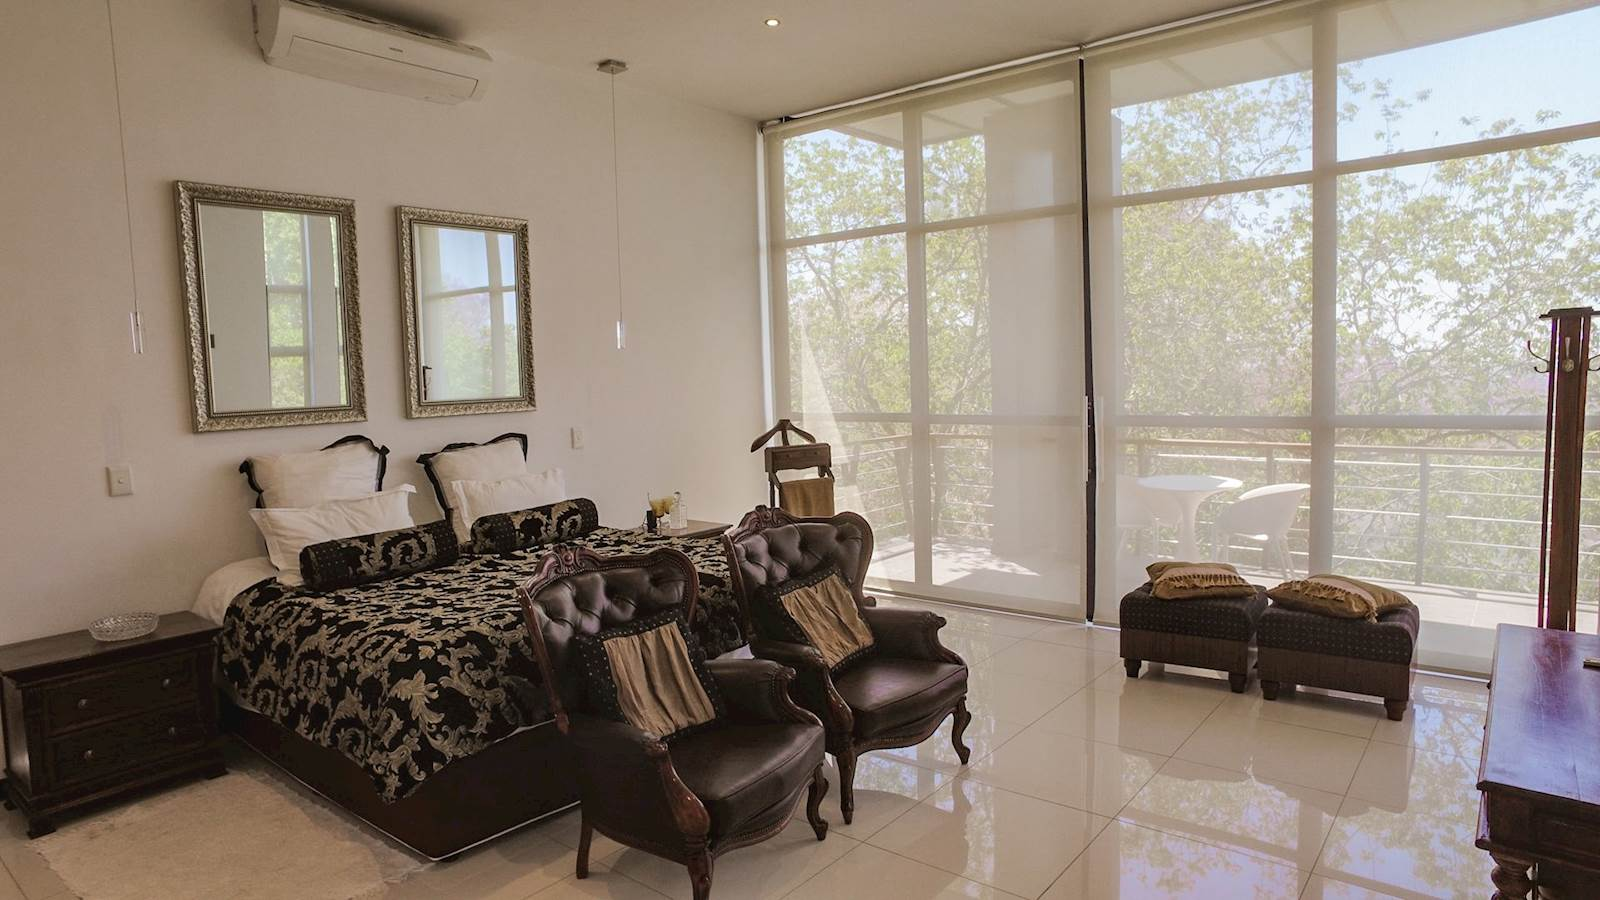 3 Bedroom House sold in Waterkloof Ridge ENT0010698 : photo#16